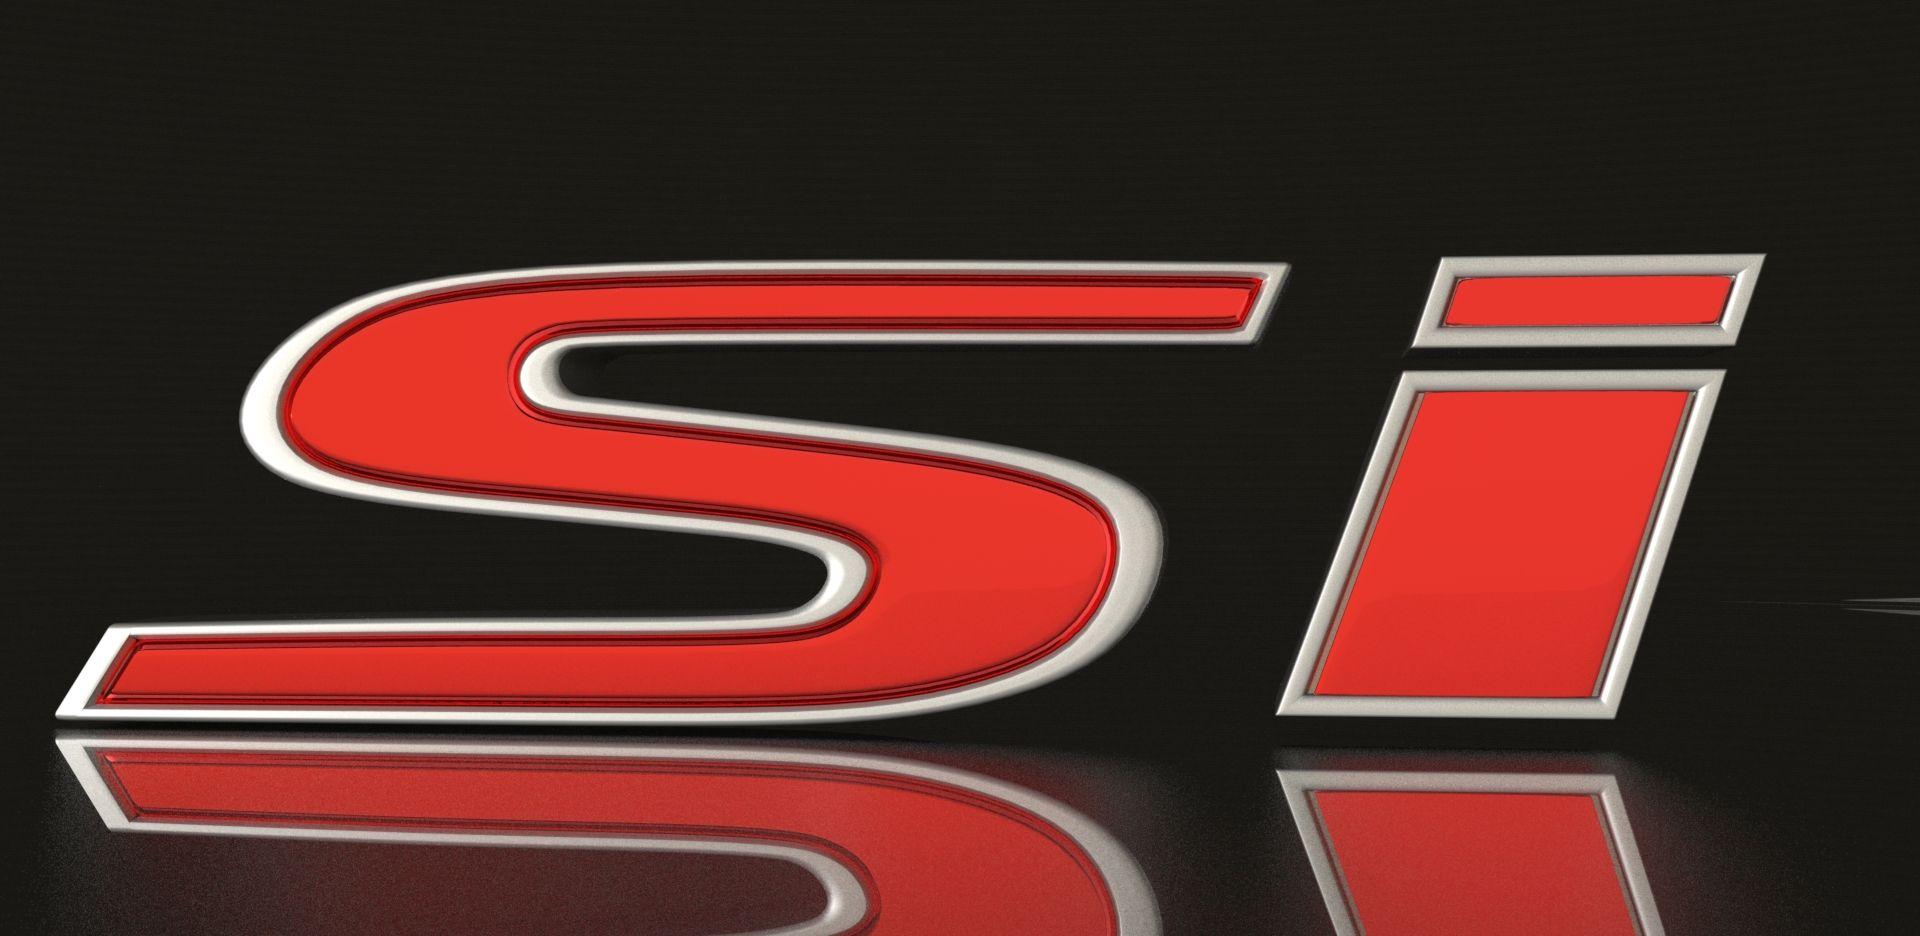 honda si logo wallpaper image 293 adorable wallpapers rh pinterest com honda civic si logo civic si logo vector